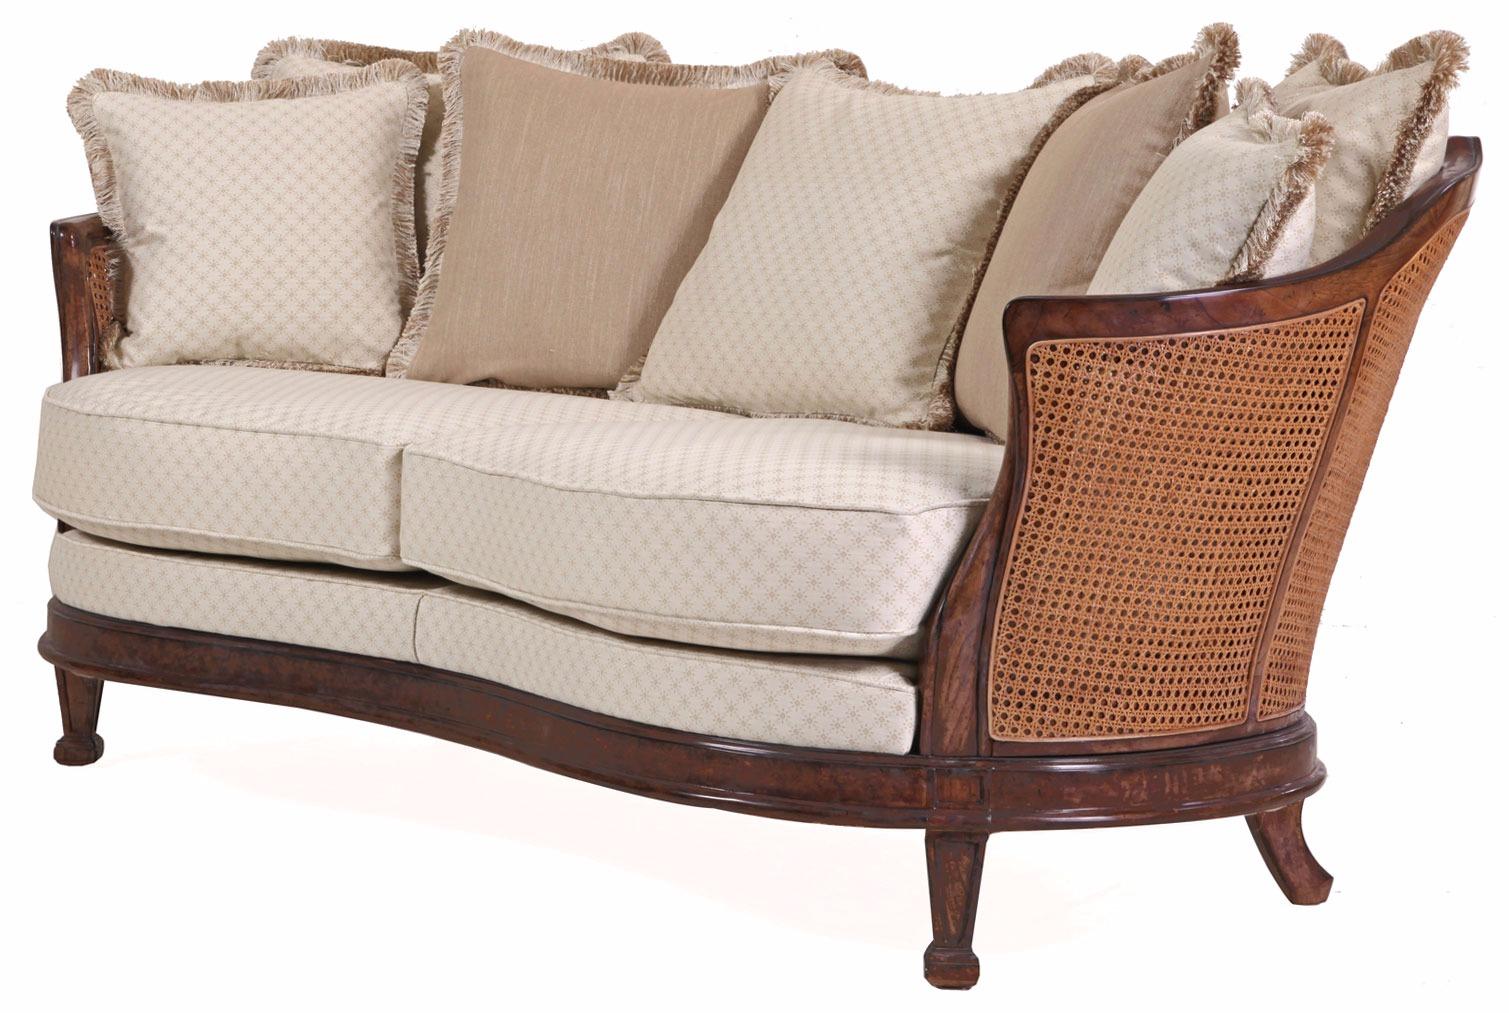 Mauretania sofa with rattan panelling